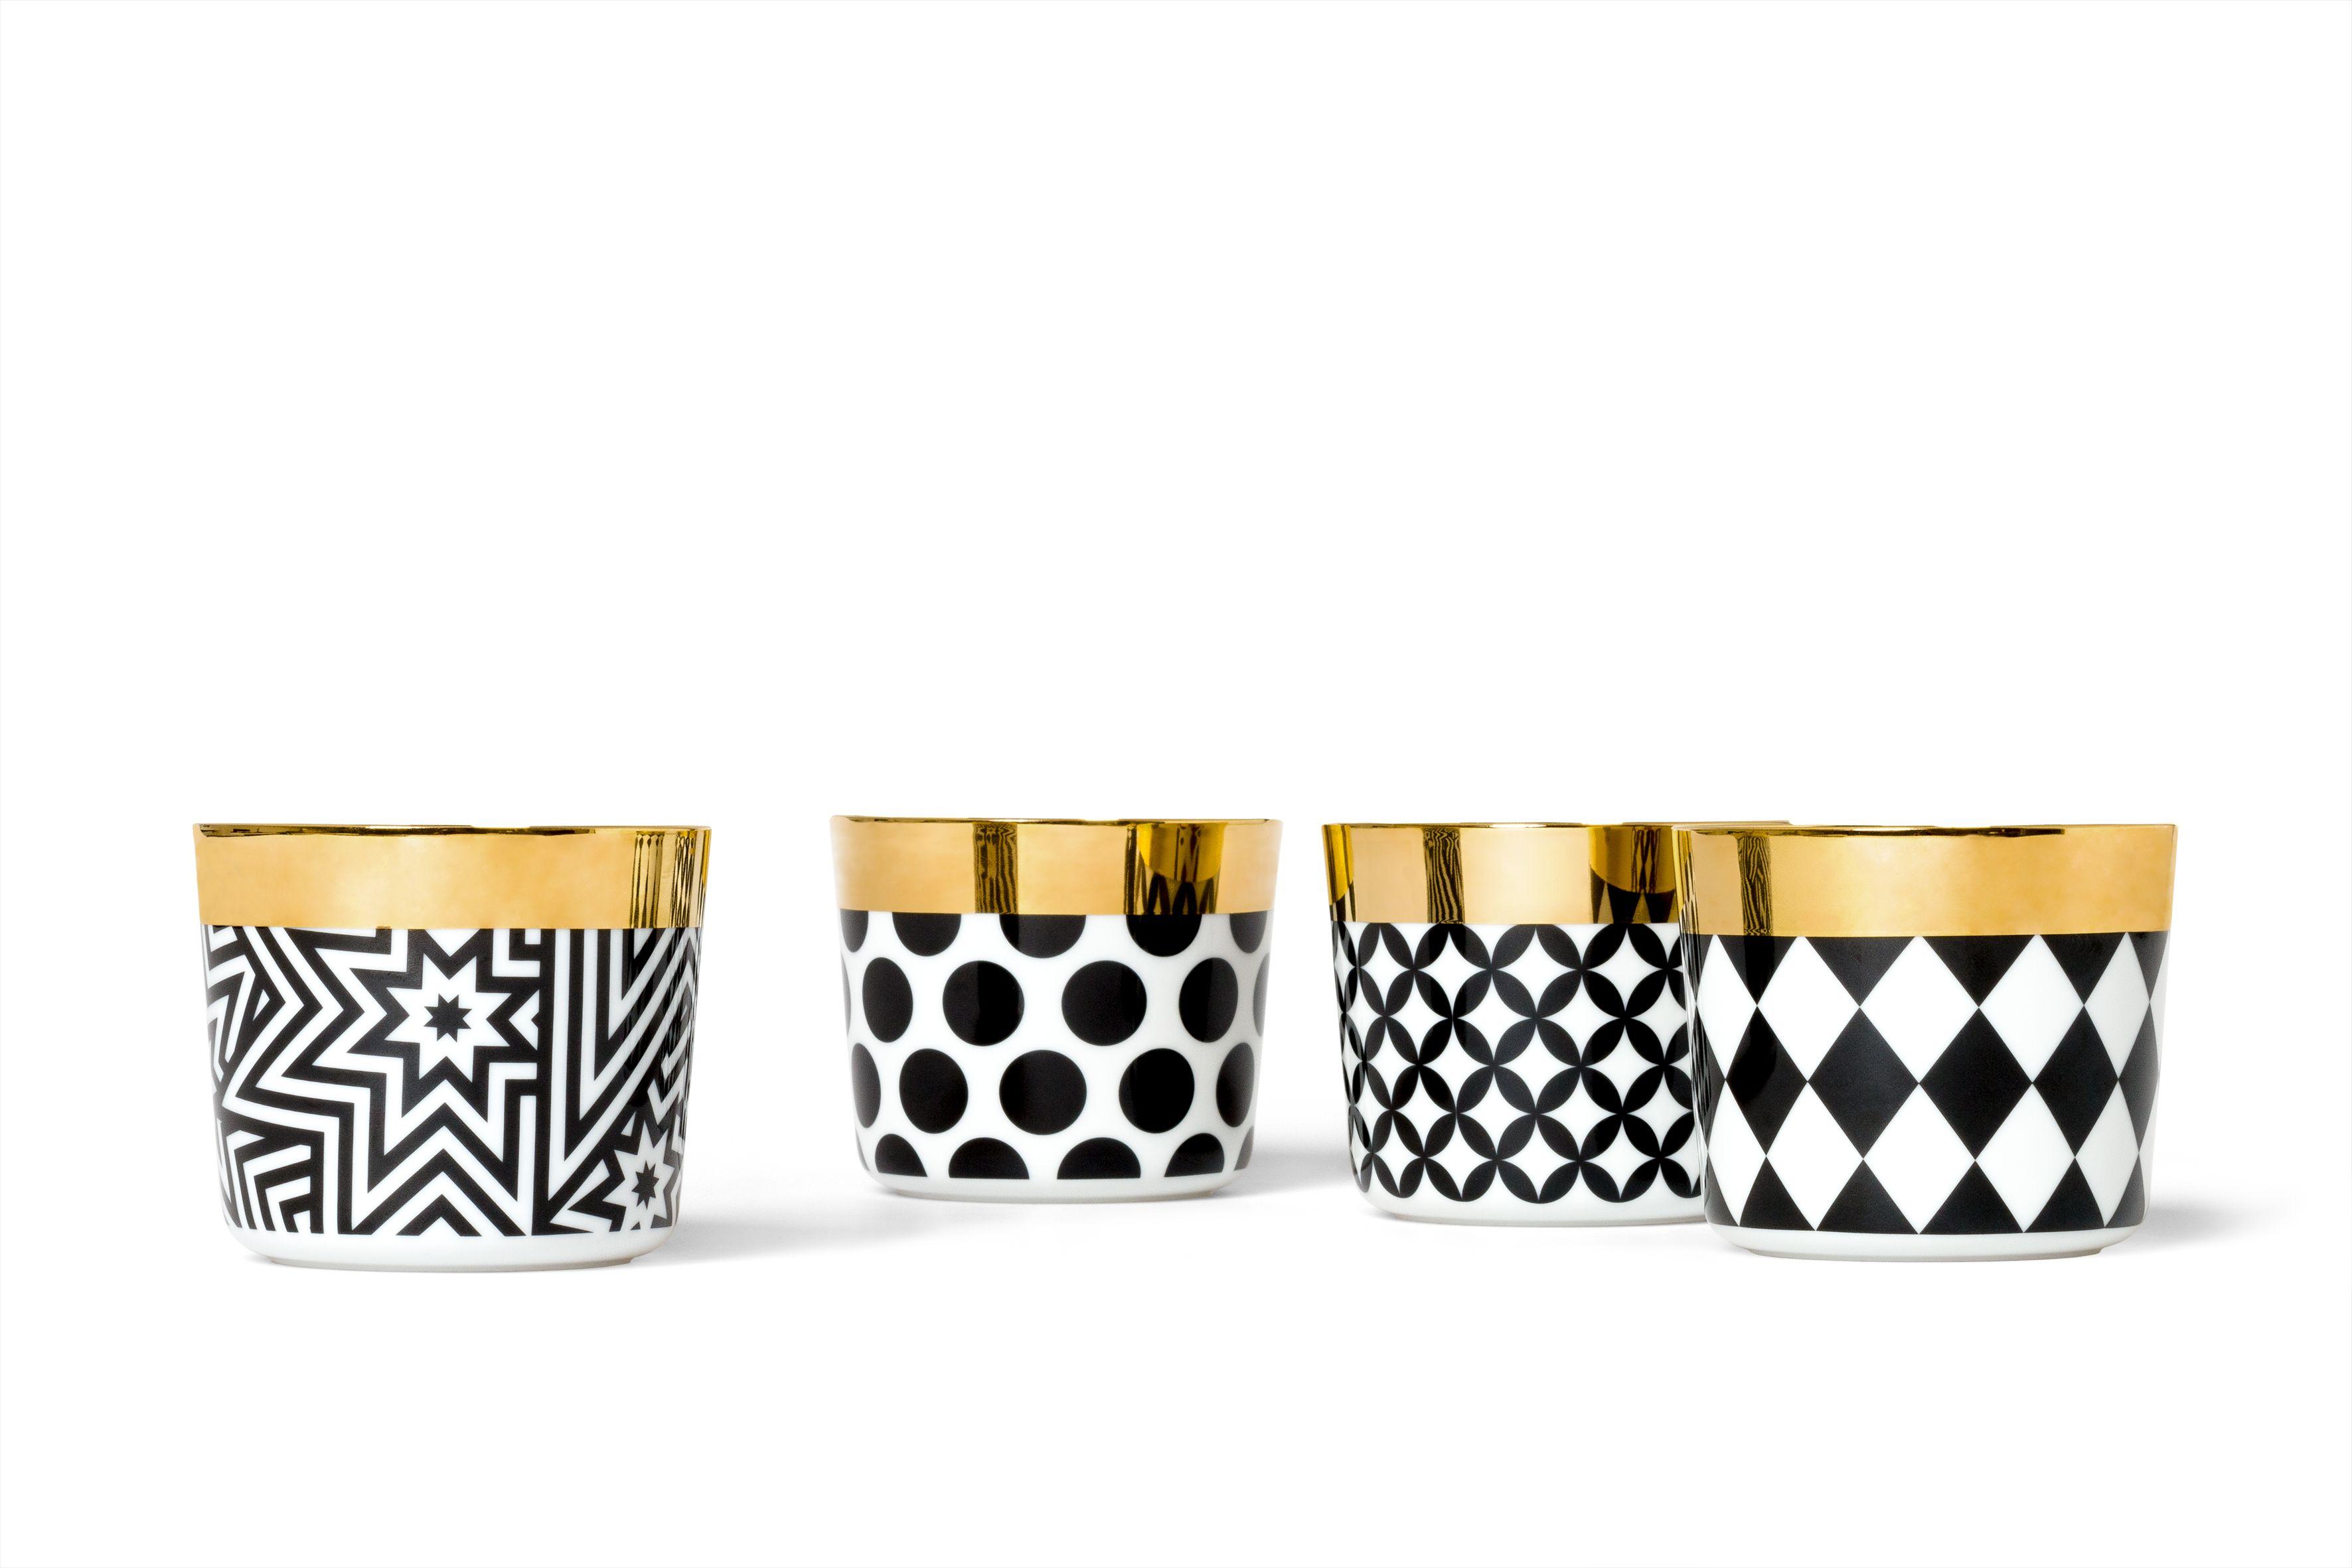 Black & White champagne goblets #sipofgold by #siegerbyfürstenberg – #goblets #tumblers #tabelware #decoration #siegergermany